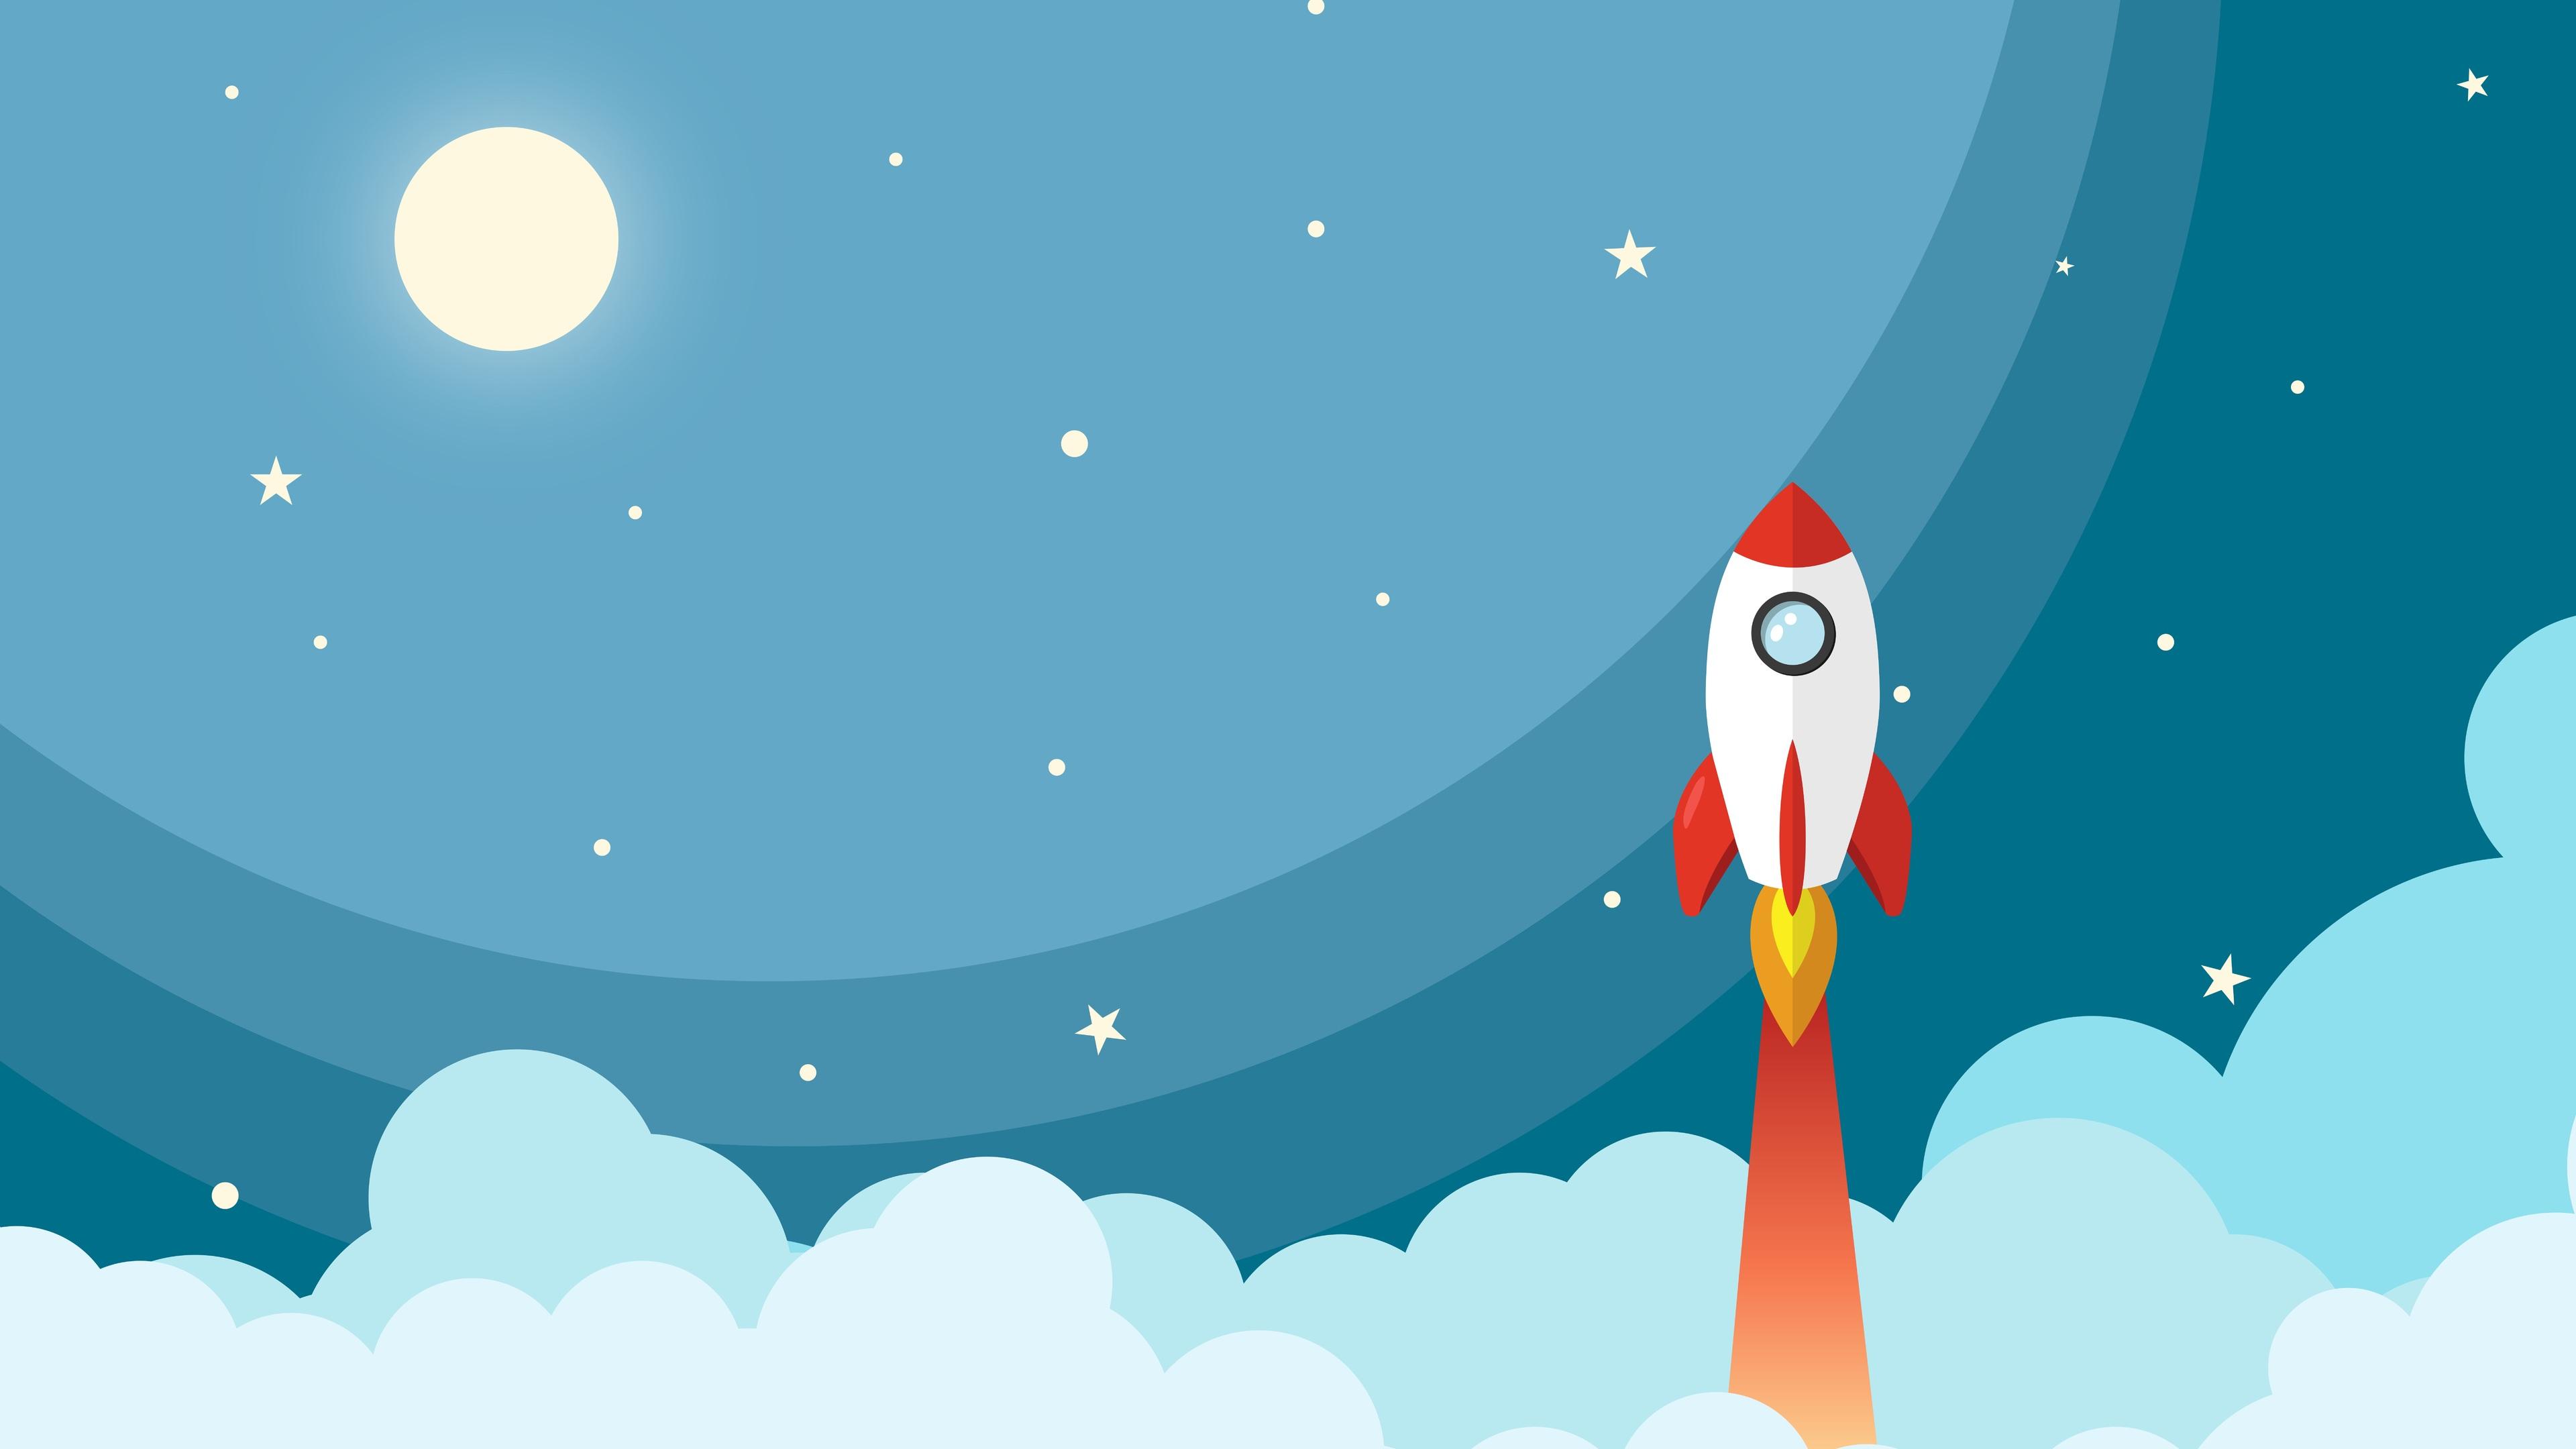 artistic cloud rocket 4k artwork 1540754276 - Artistic Cloud Rocket 4k Artwork - rocket wallpapers, hd-wallpapers, cloud wallpapers, artwork wallpapers, artistic wallpapers, artist wallpapers, 8k wallpapers, 5k wallpapers, 4k-wallpapers, 12k wallpapers, 10k wallpapers